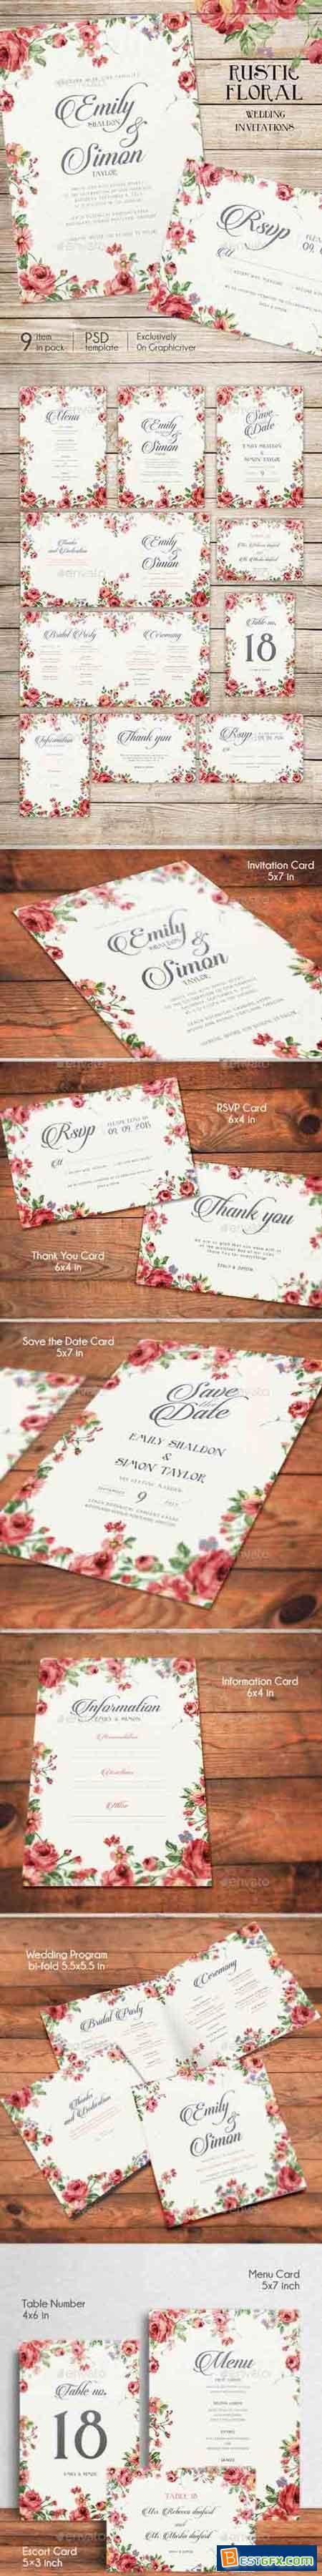 Rustic Floral Wedding Invitations 10358801